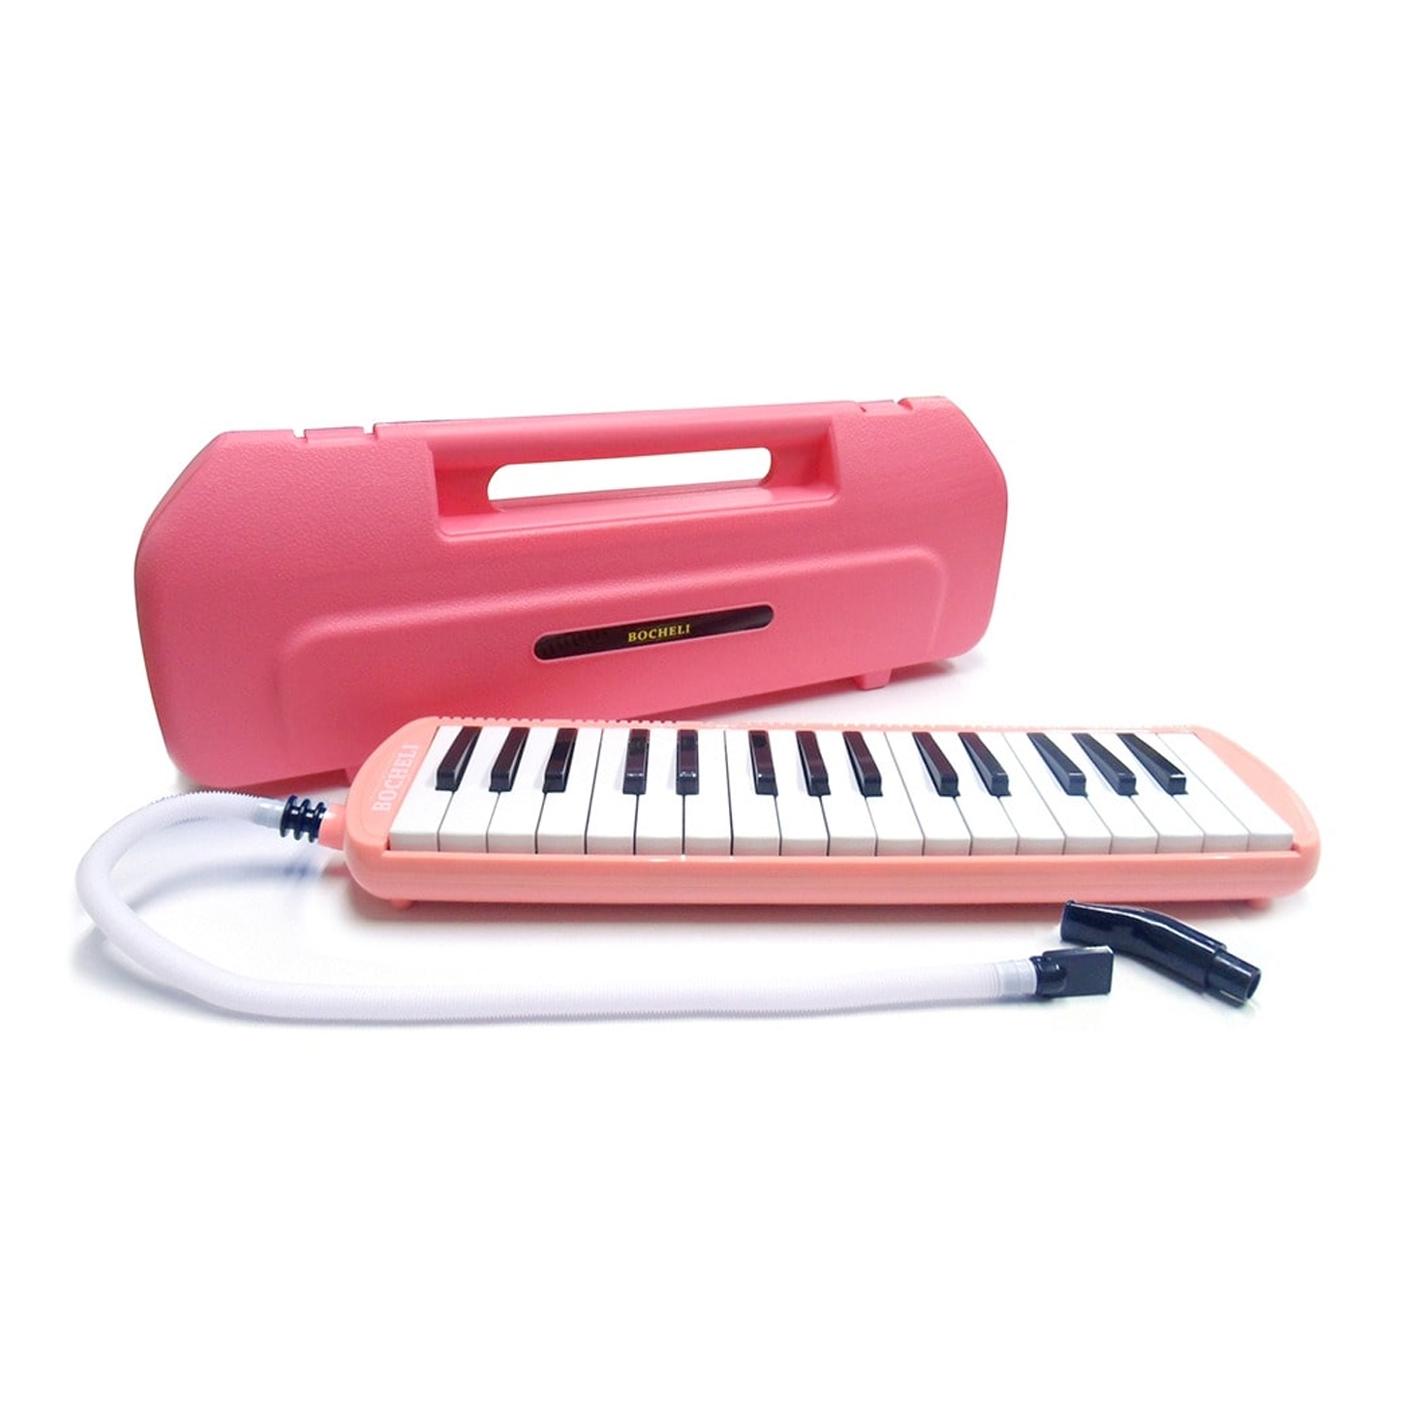 Melodica Bocheli de 32 notas rosa